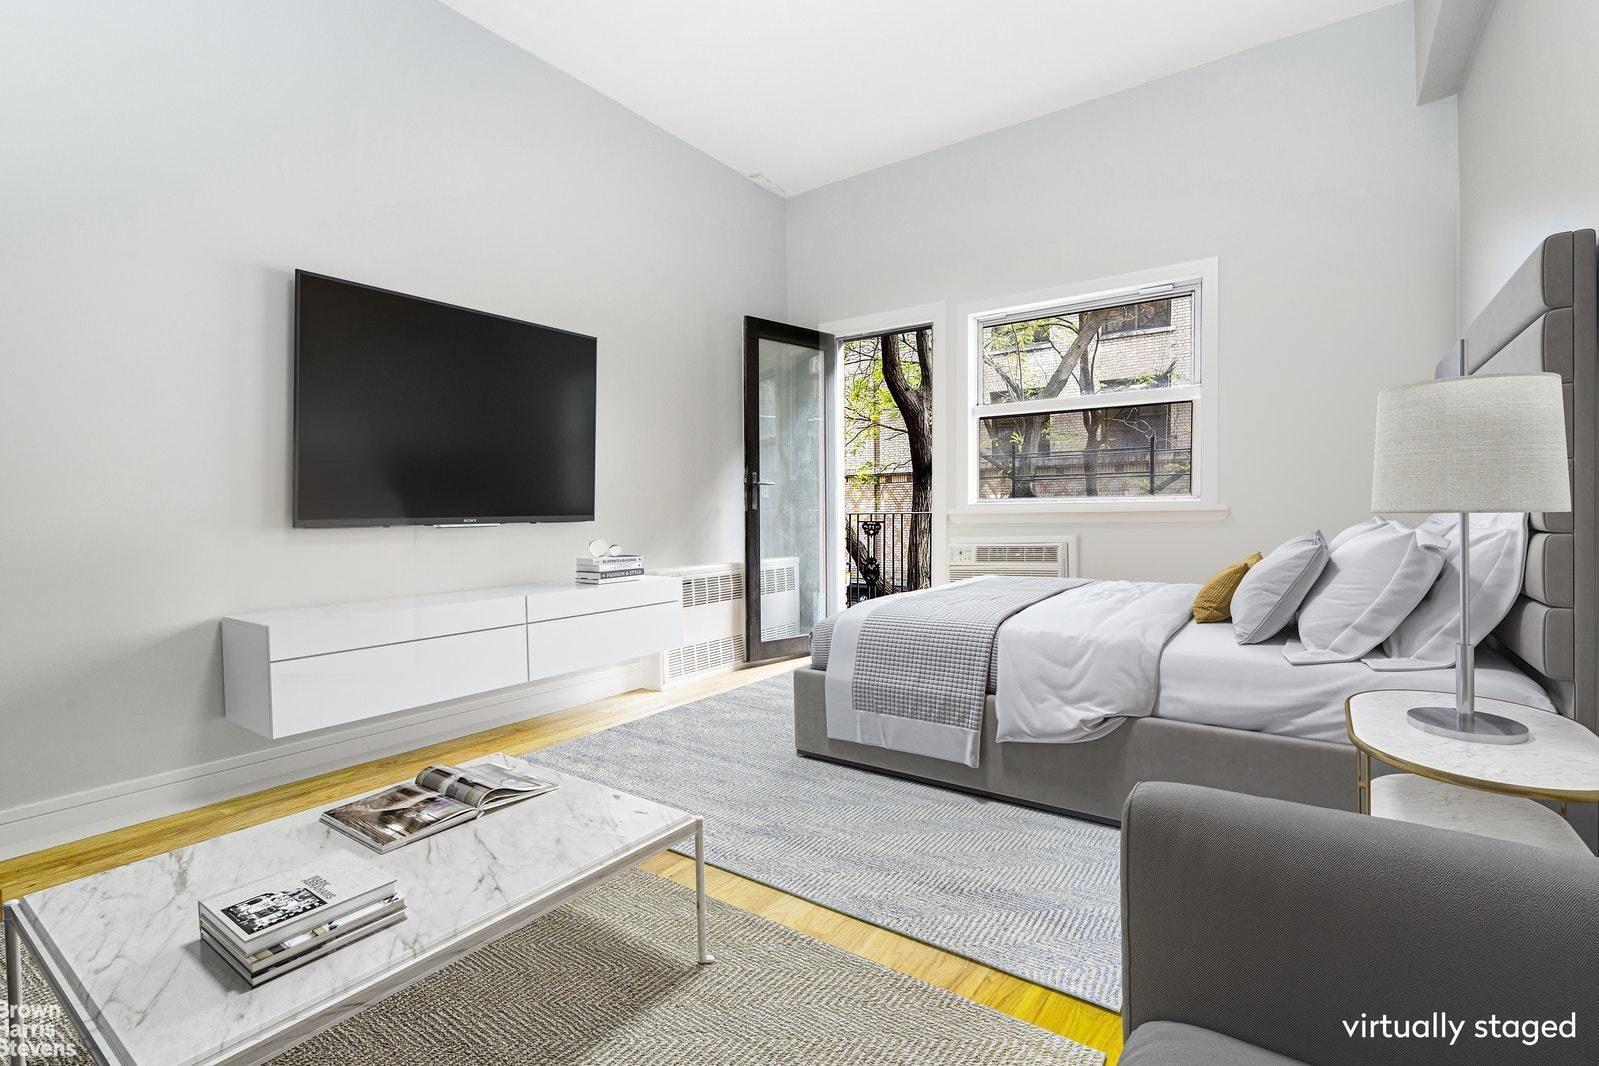 Apartment for sale at 211 Thompson Street, Apt 2K